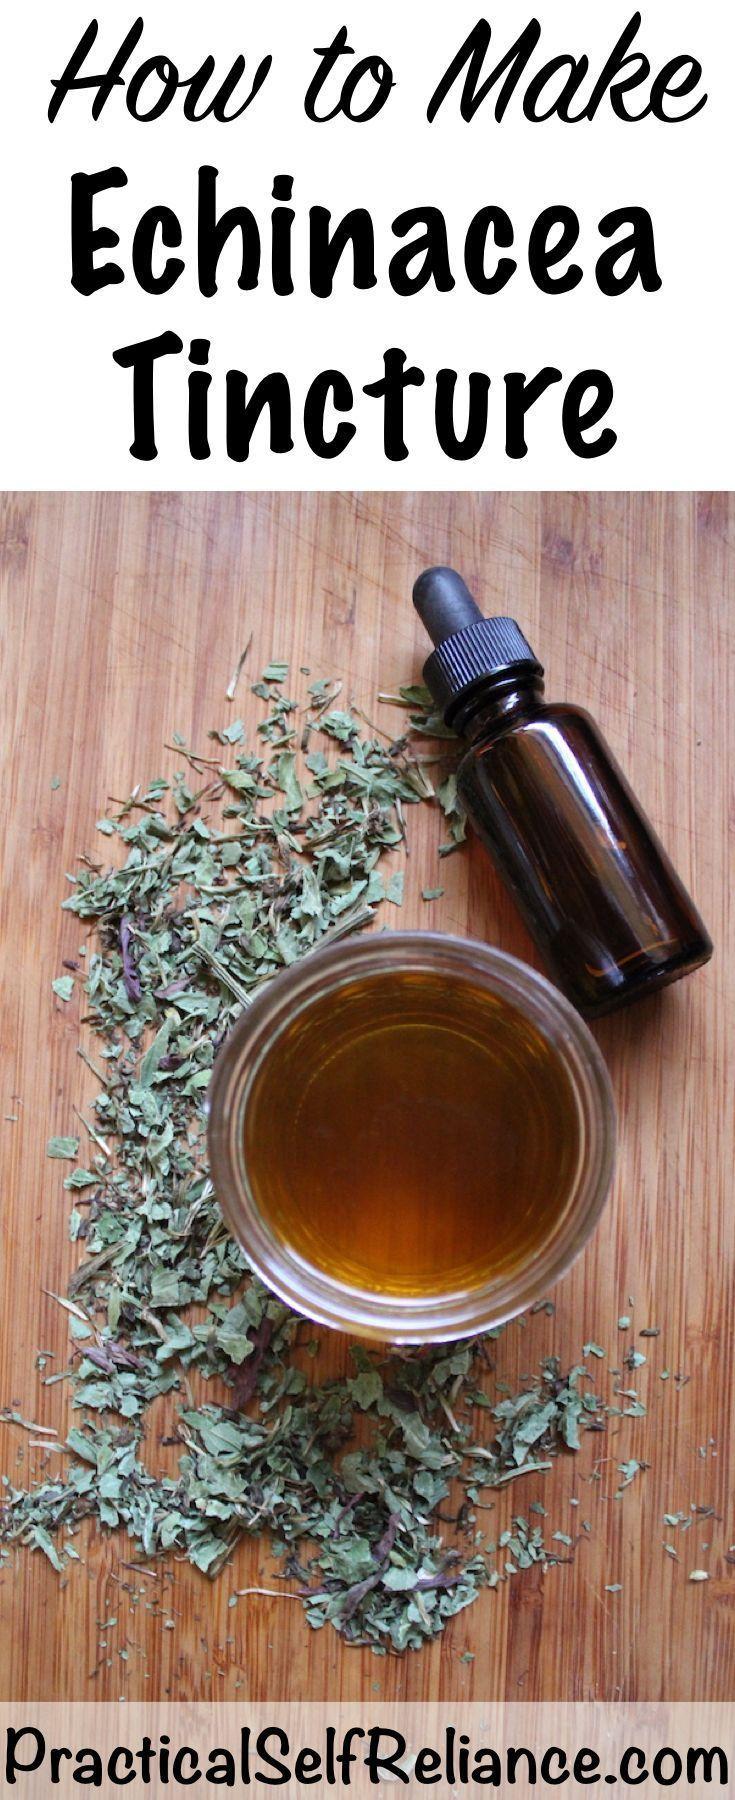 How to make echinacea tincture diy recipe herbal